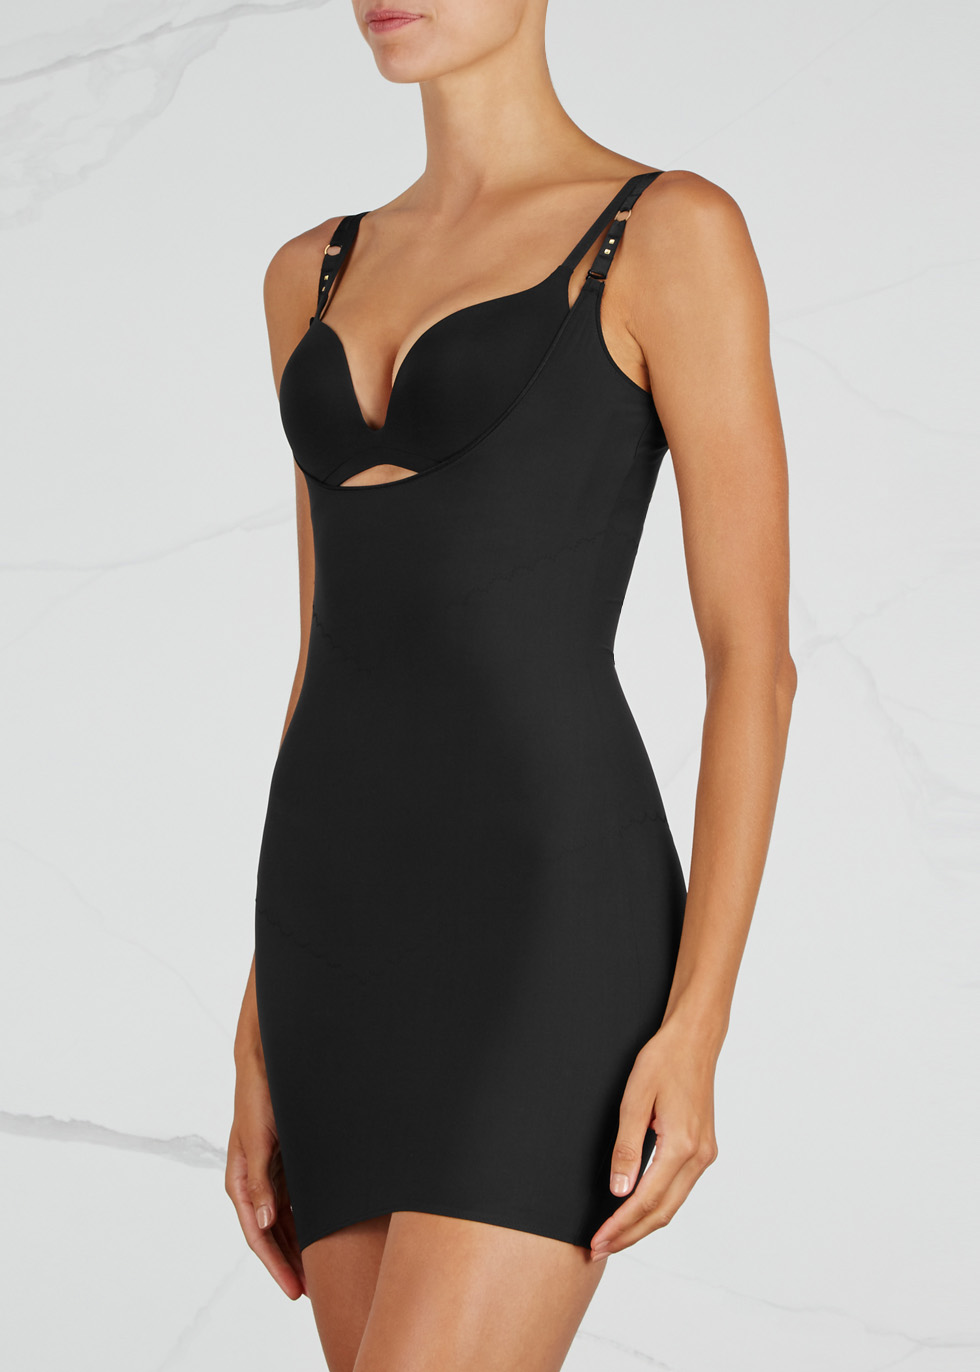 Beauty Secret black shaping dress - Wacoal